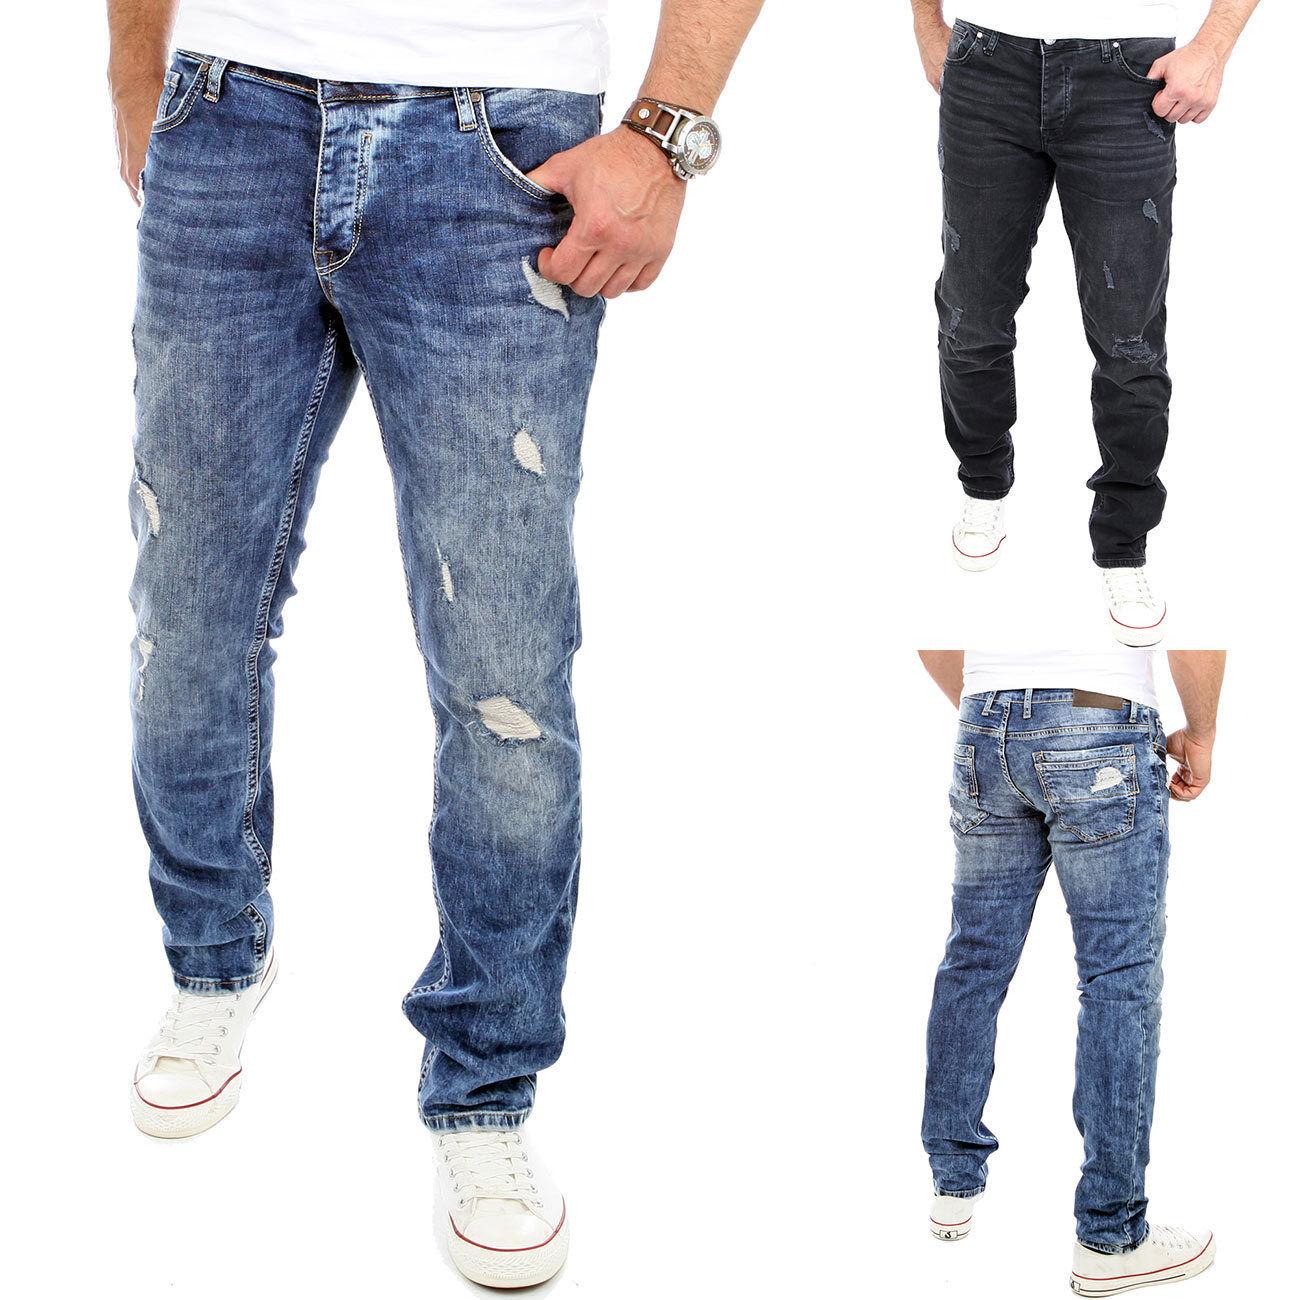 Reslad Jeans-Hose Herren-Hose Stretch Slim Fit Denim Blau /& Schwarz RS-2069